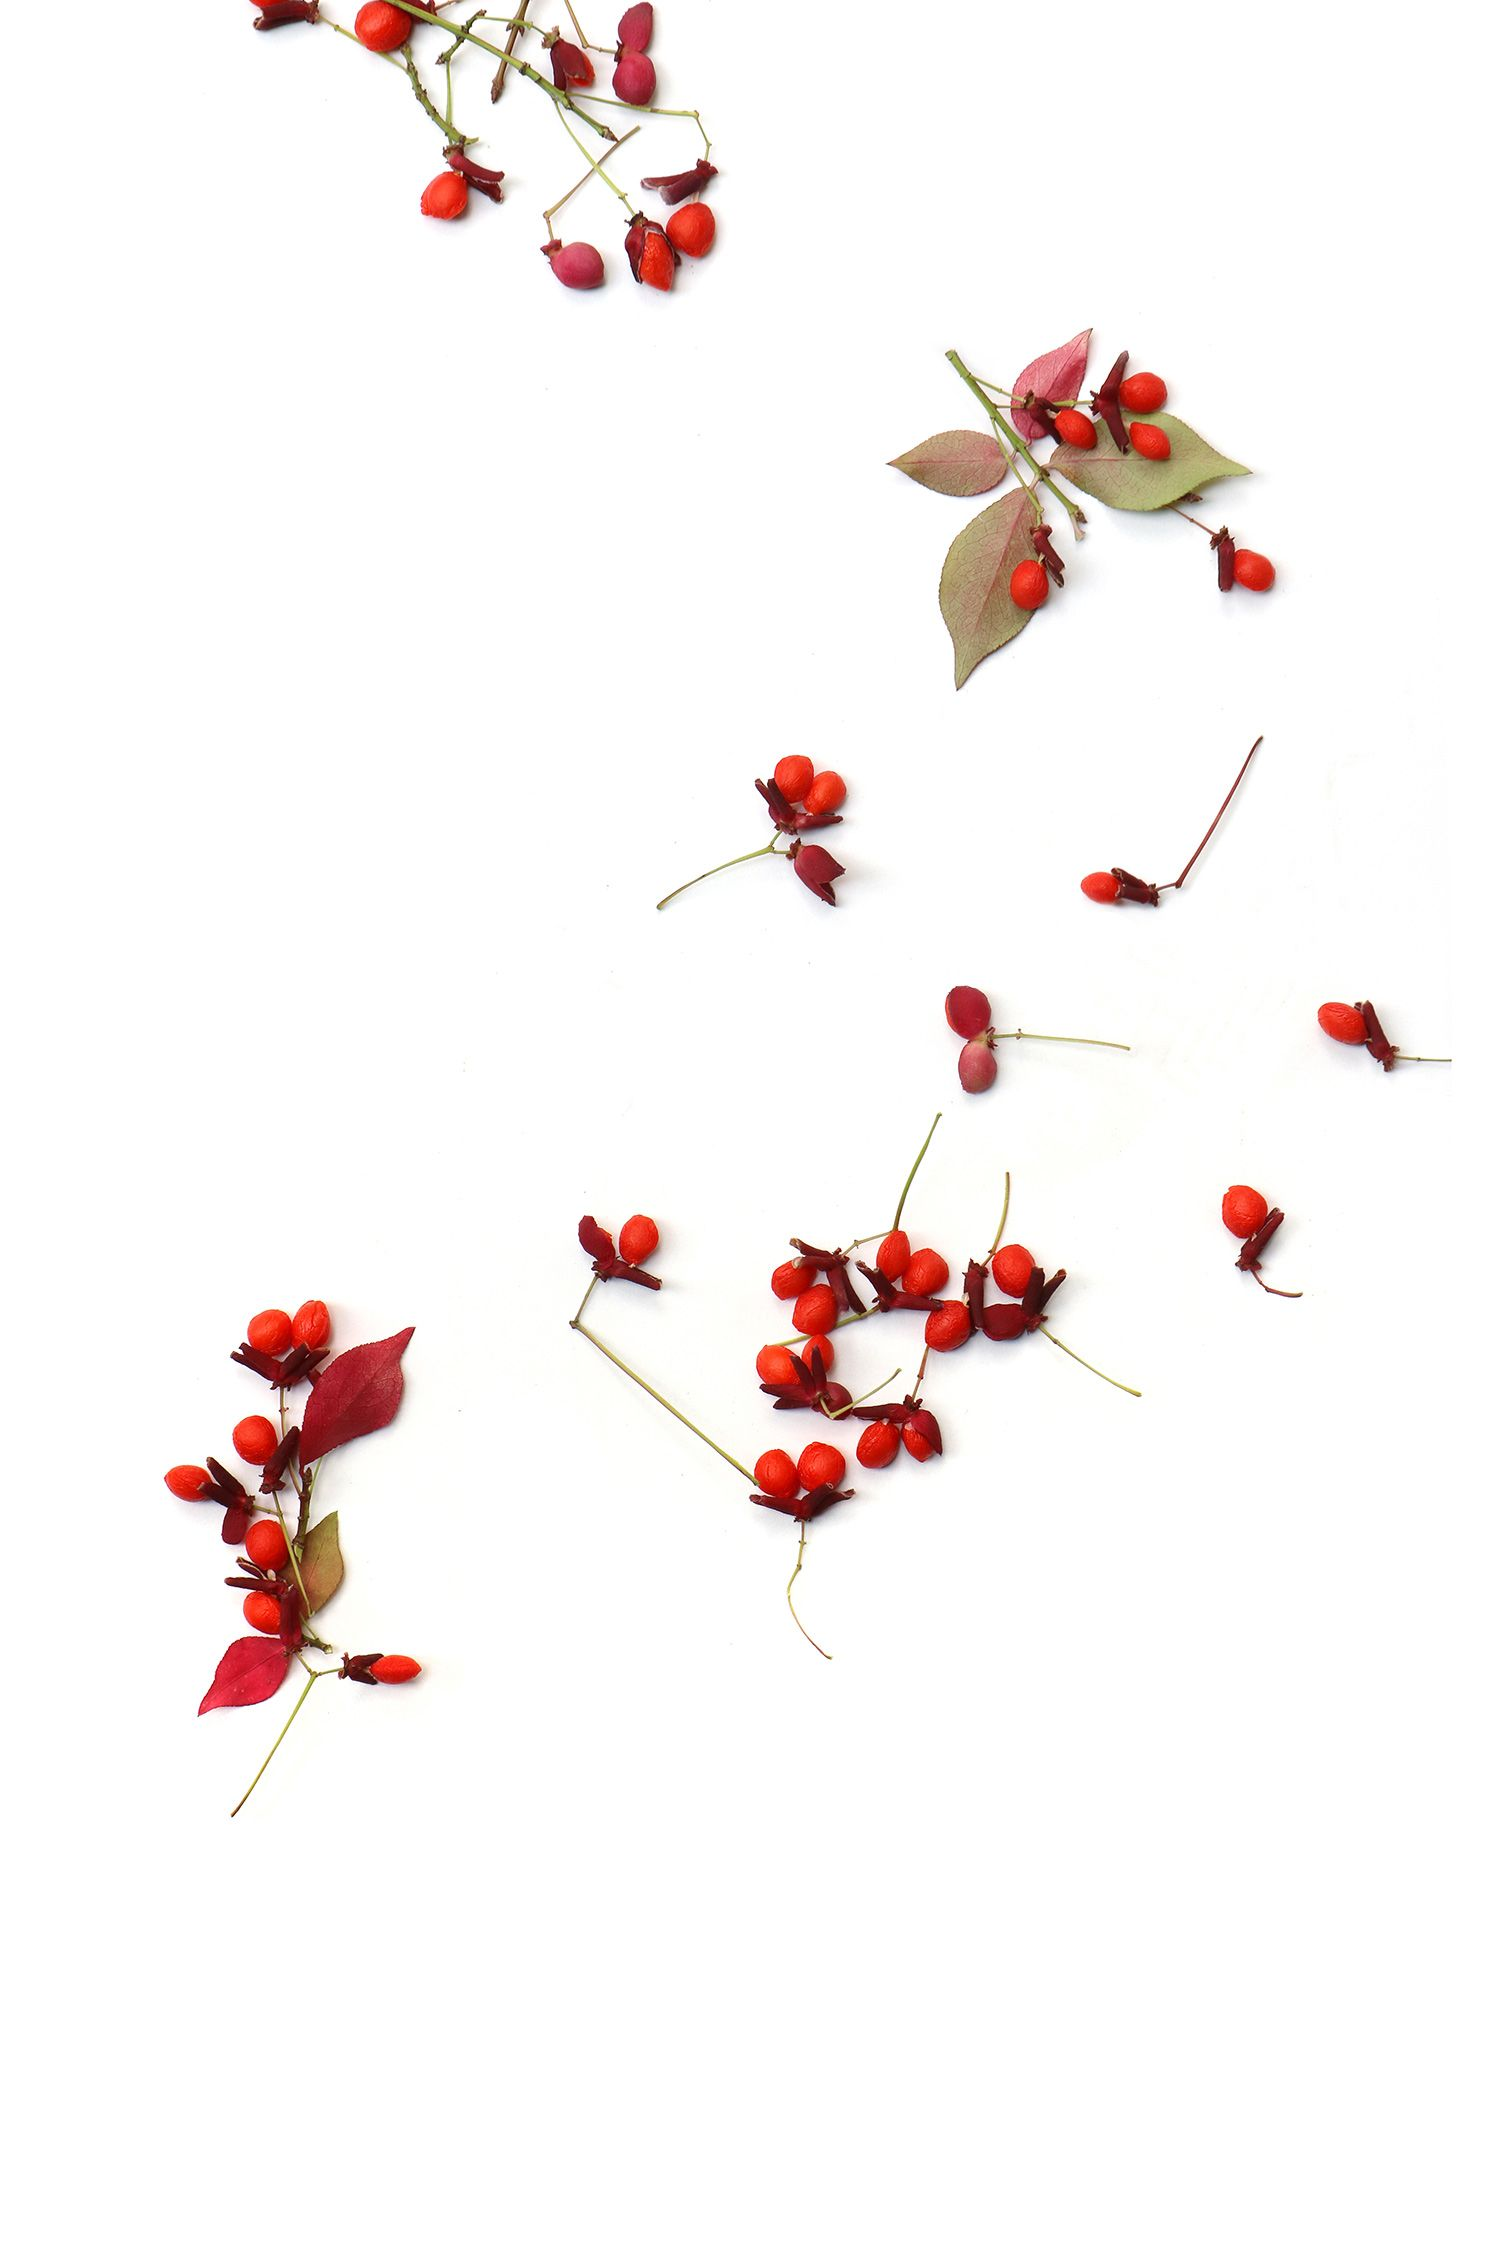 burning bush seeds (mary jo hoffman) | STILL on white in